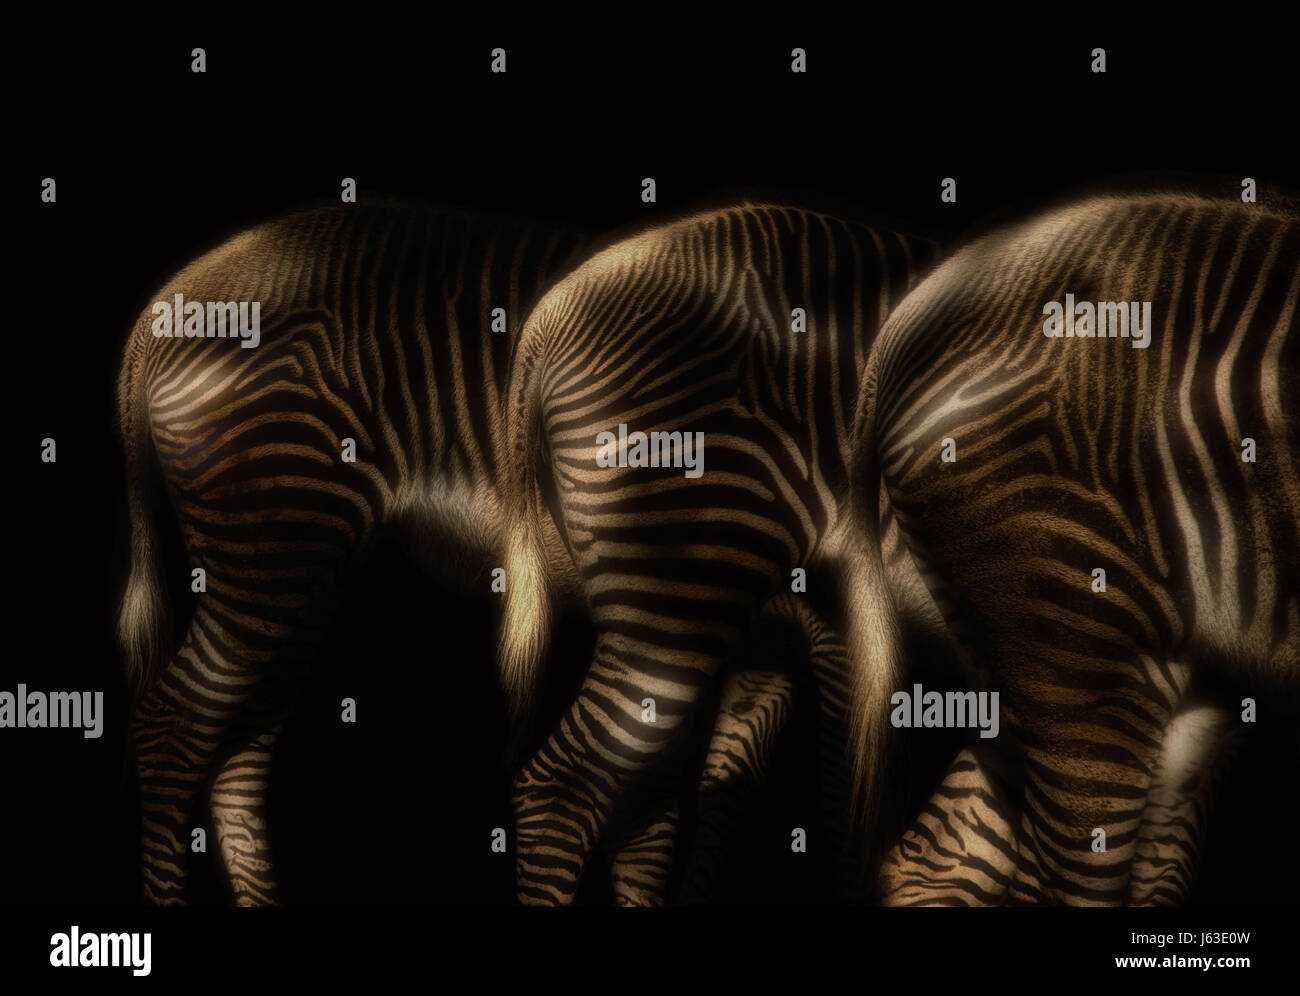 zebras in lights glow - light painting - Stock Image